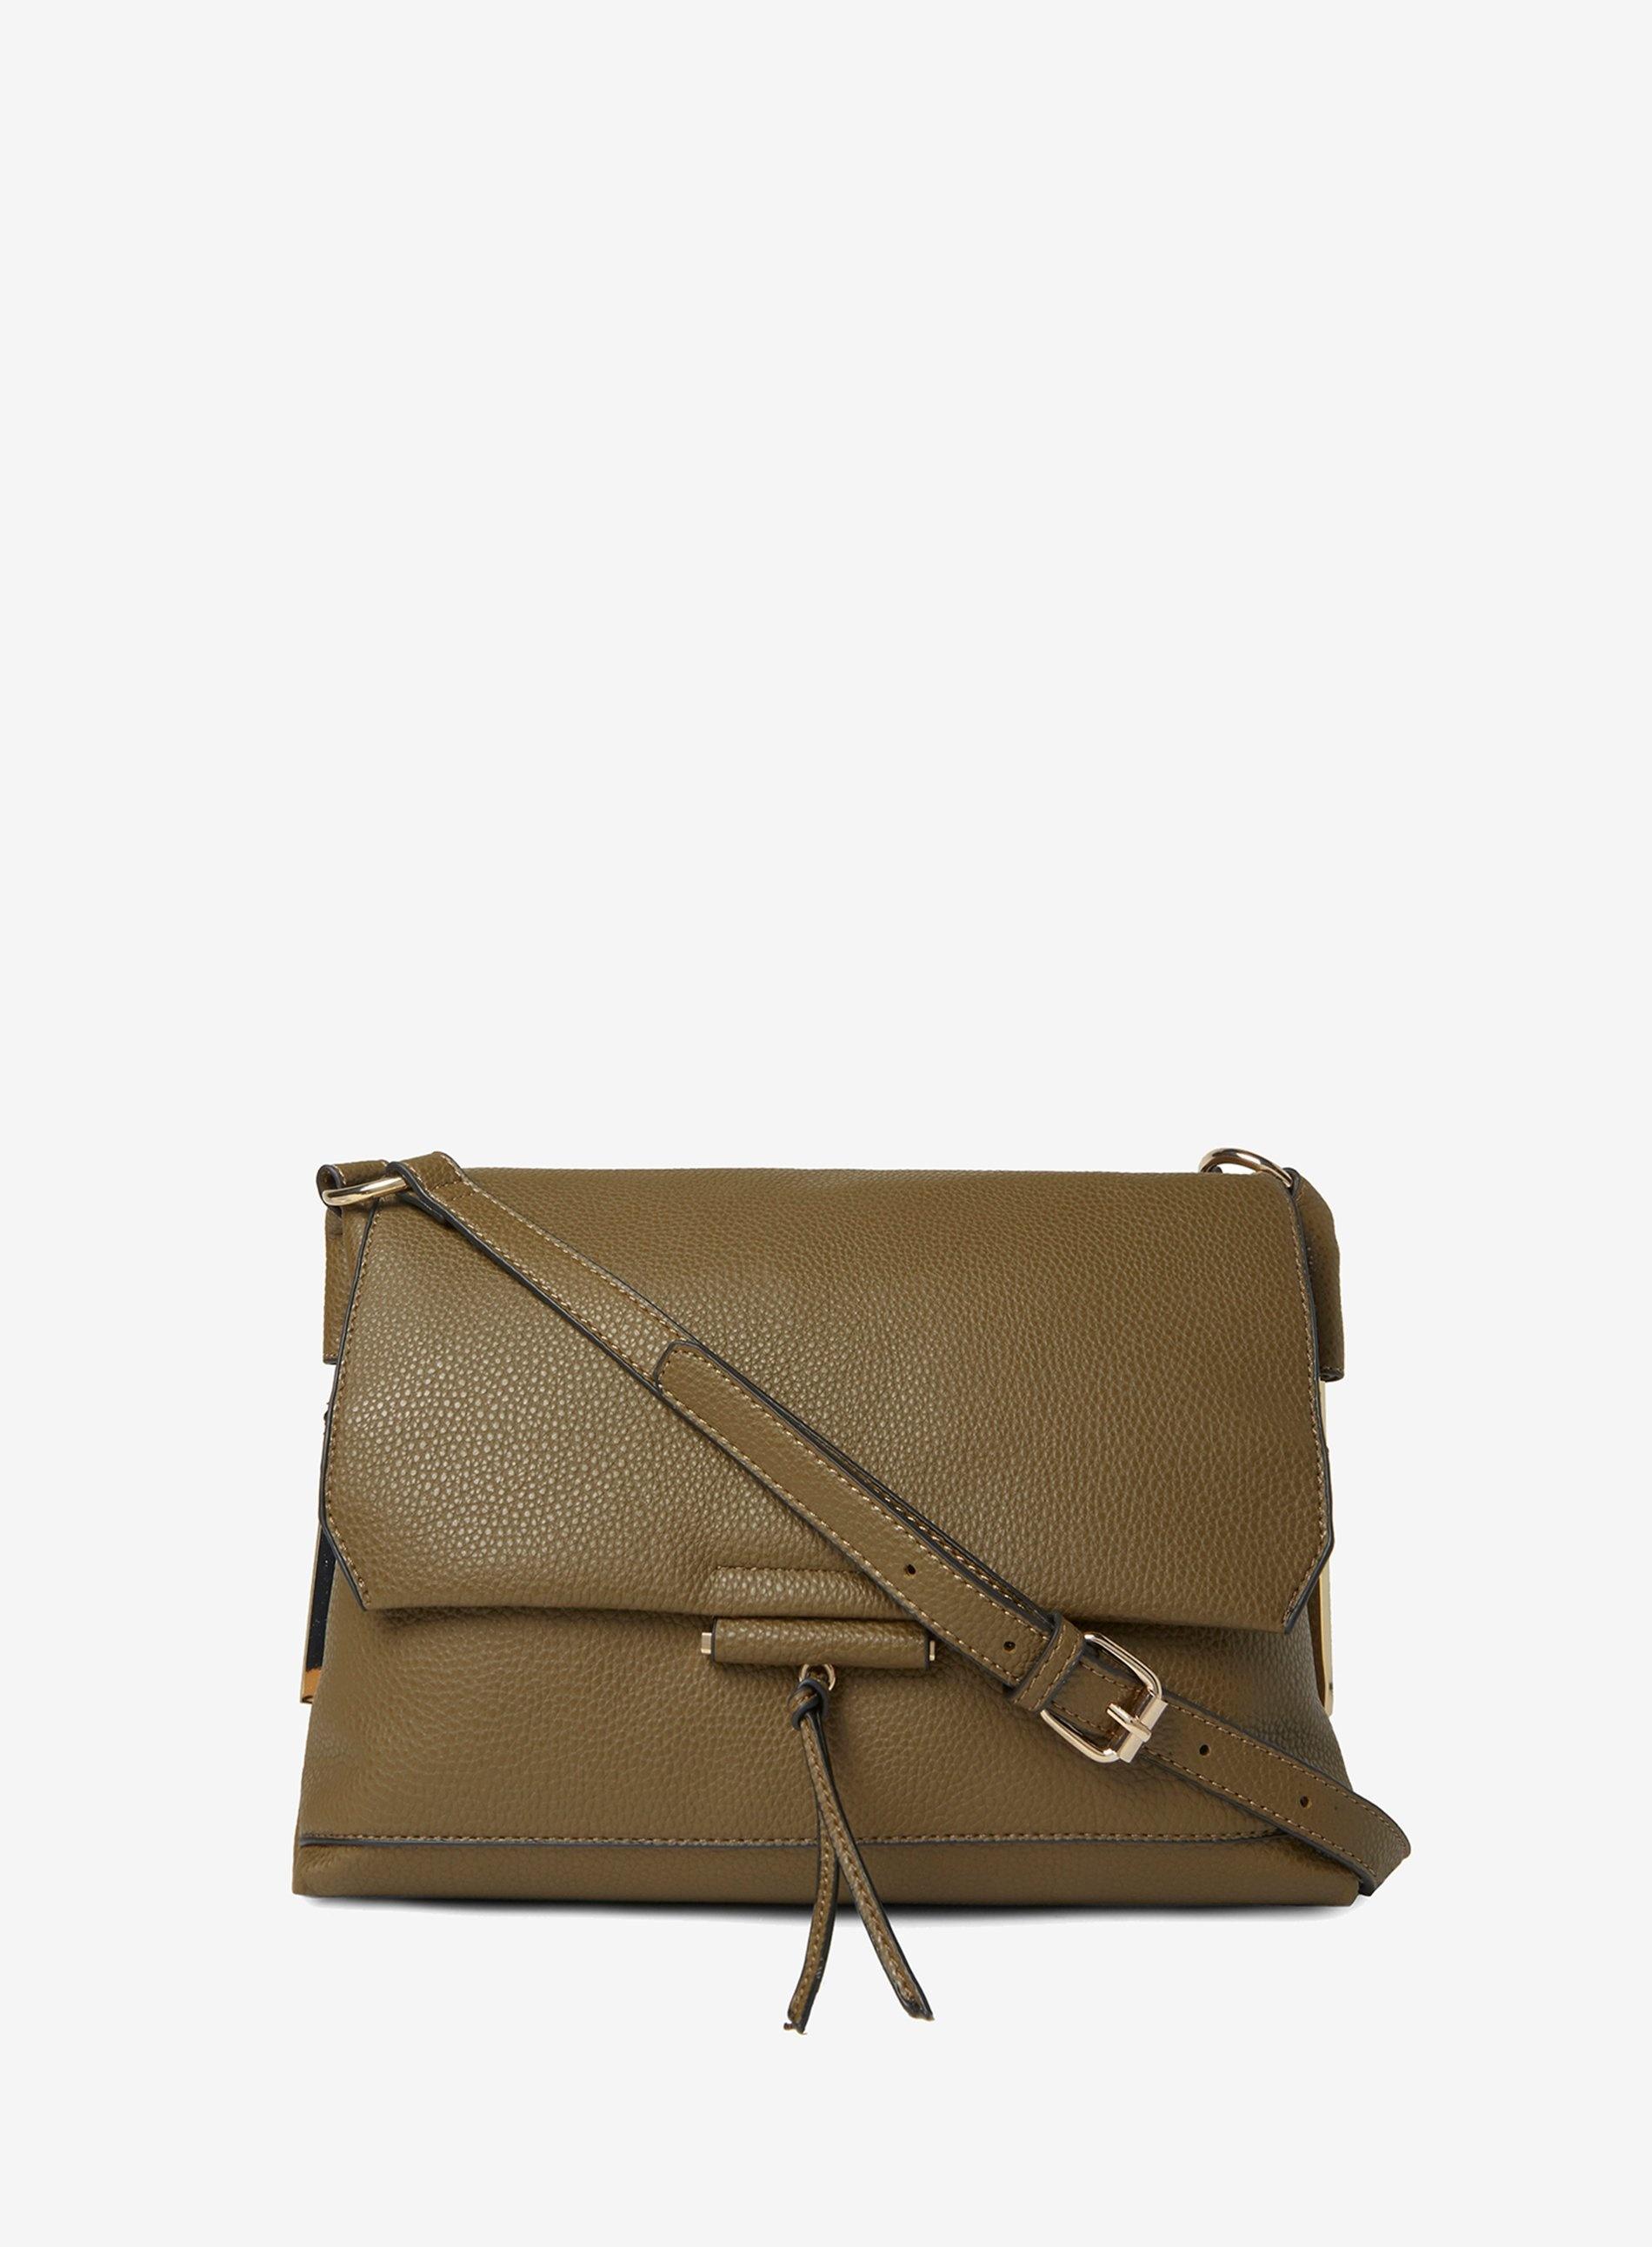 3791376603cb Dorothy Perkins Khaki Metal Side Cross Body Bag in Natural - Lyst